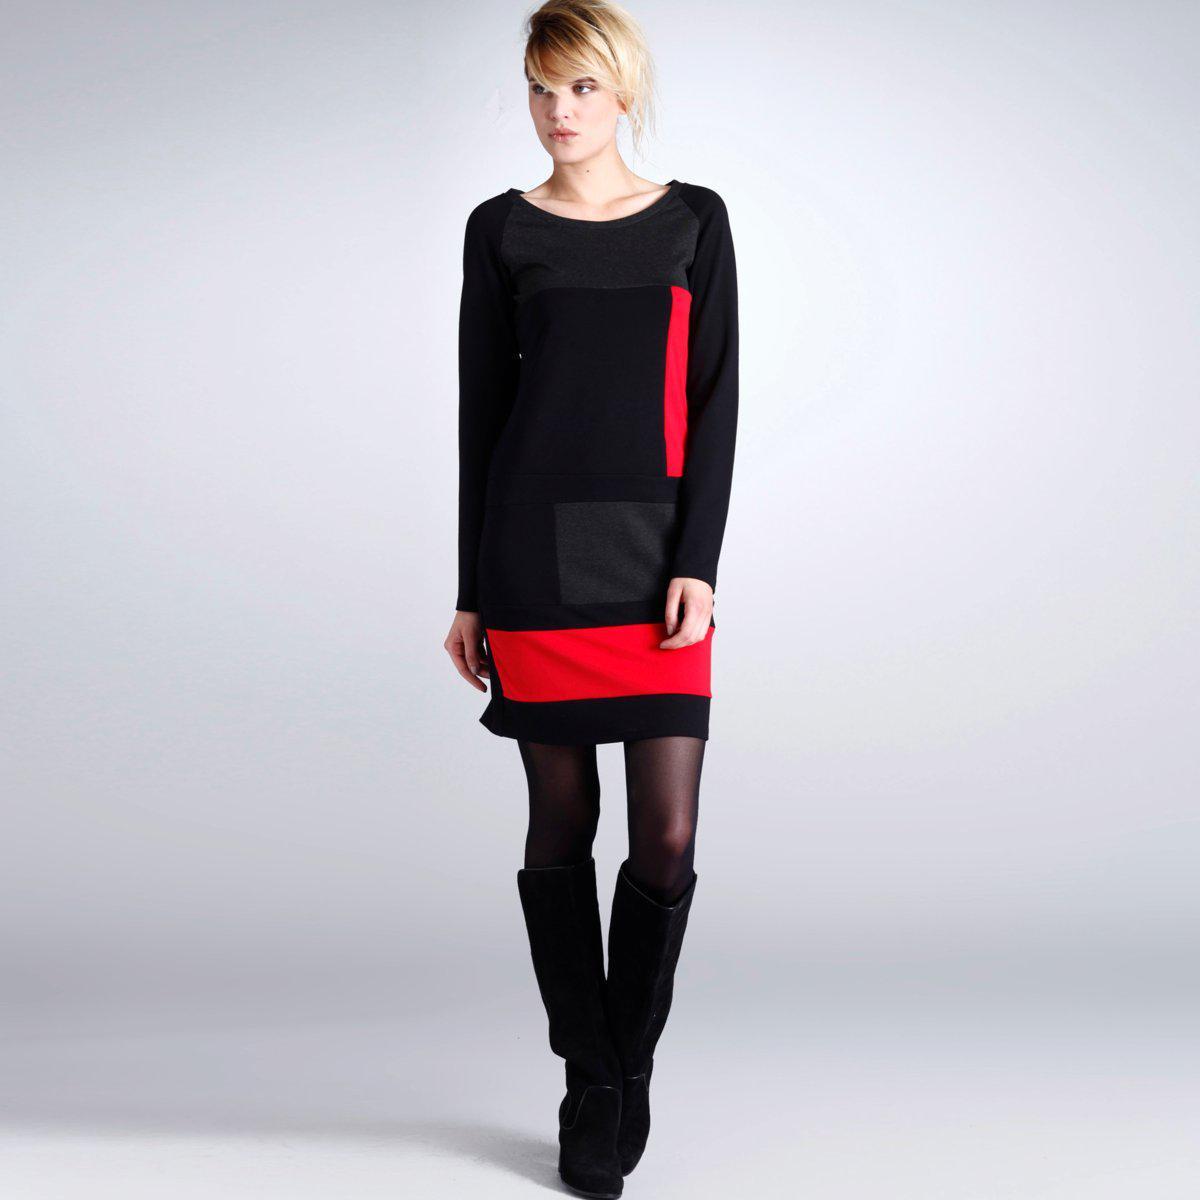 87144a9d9e17 Φορεματα La Redoute Φθινόπωρο Χειμώνας 2011 κωδ. 324245581